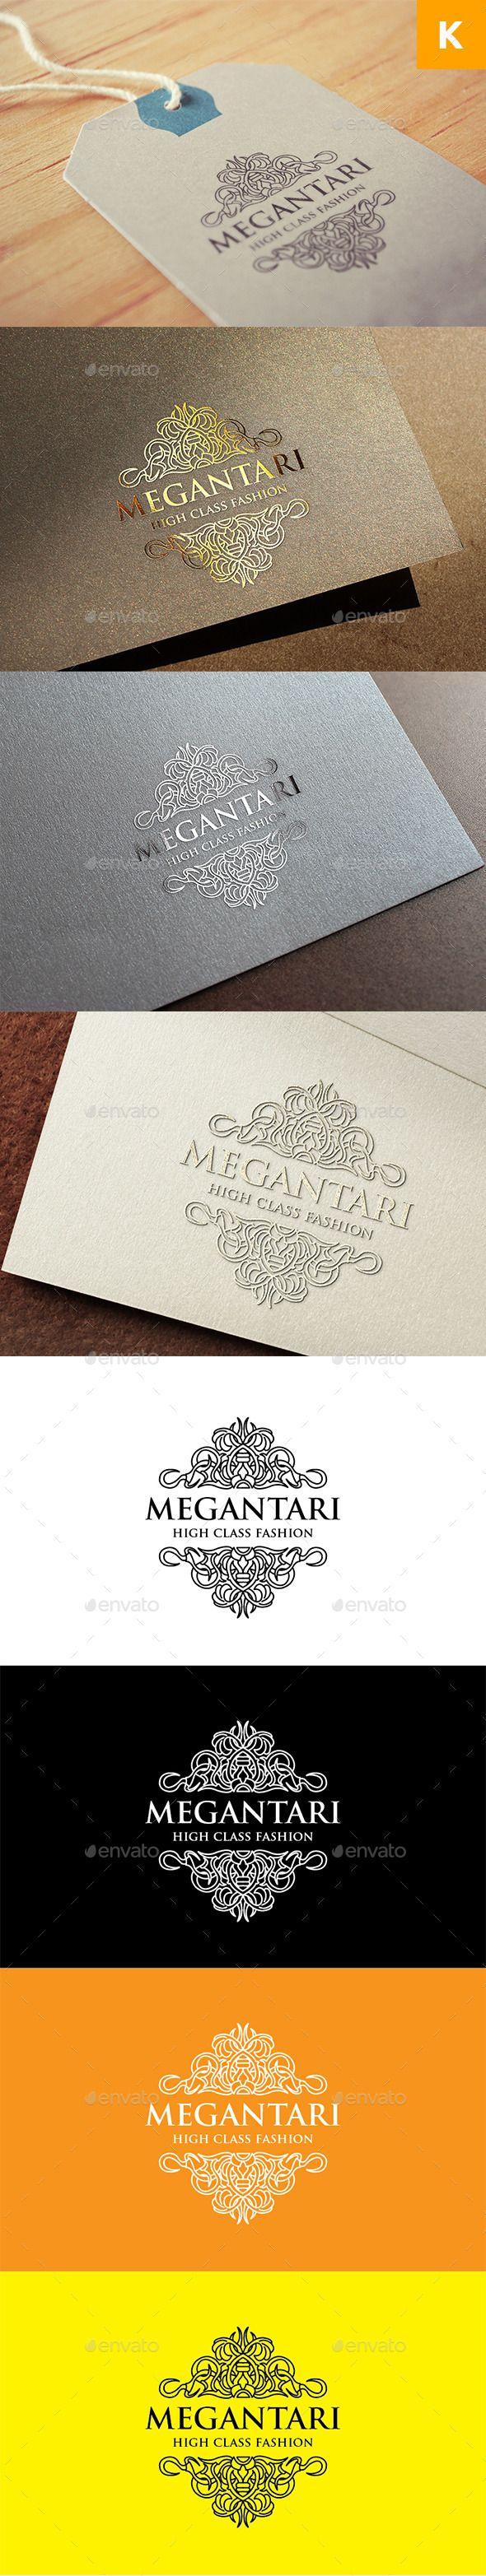 Megantari Fashion Logo — Vector EPS #hotels #apartments • Download here → https://graphicriver.net/item/megantari-fashion-logo/11169139?ref=pxcr